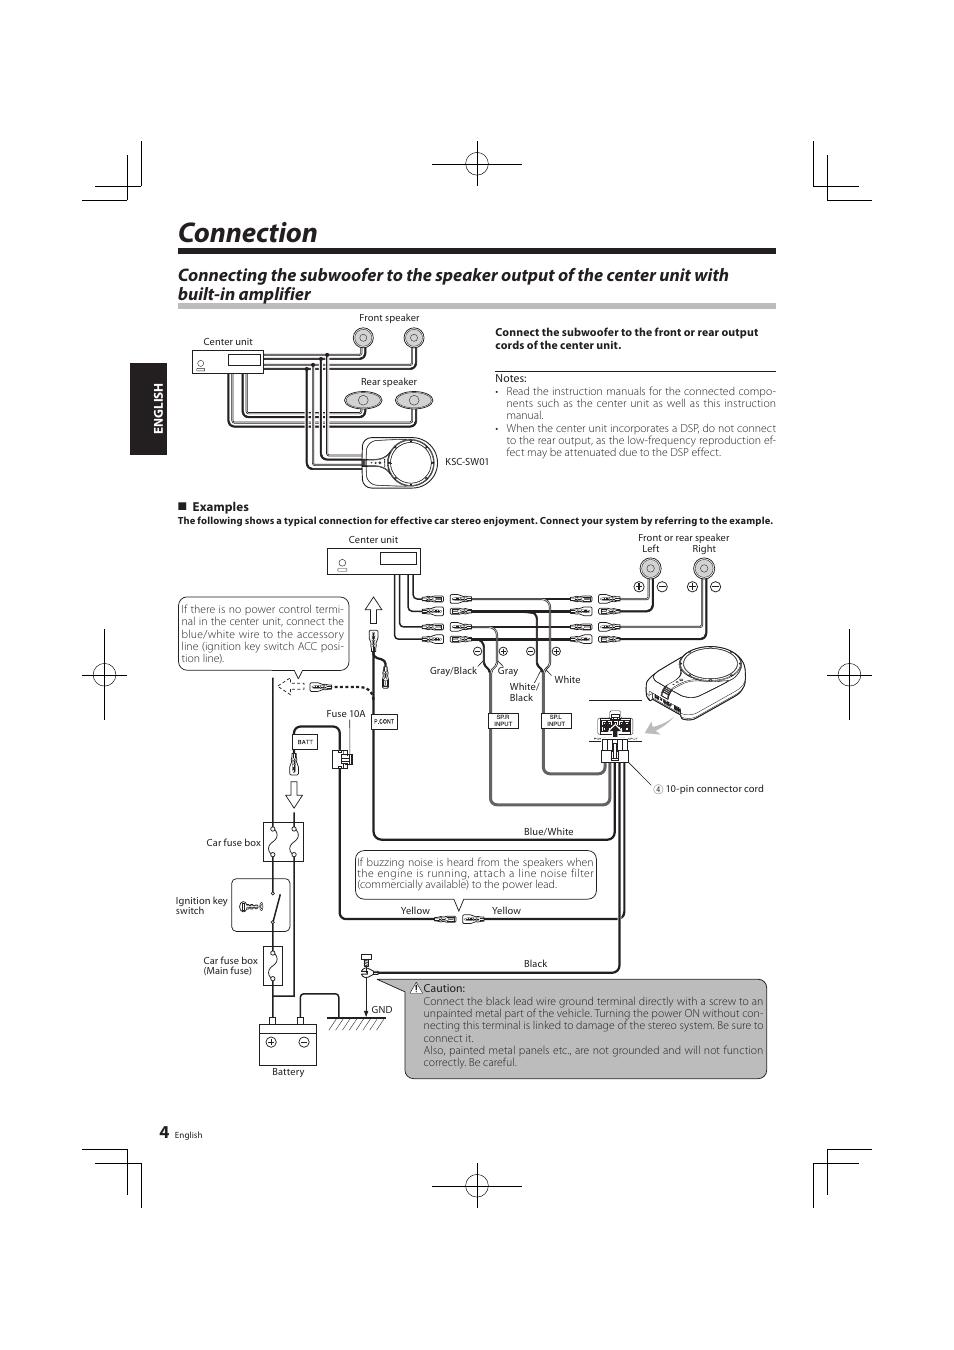 medium resolution of car fuse box making noise wiring librarycar fuse box making noise